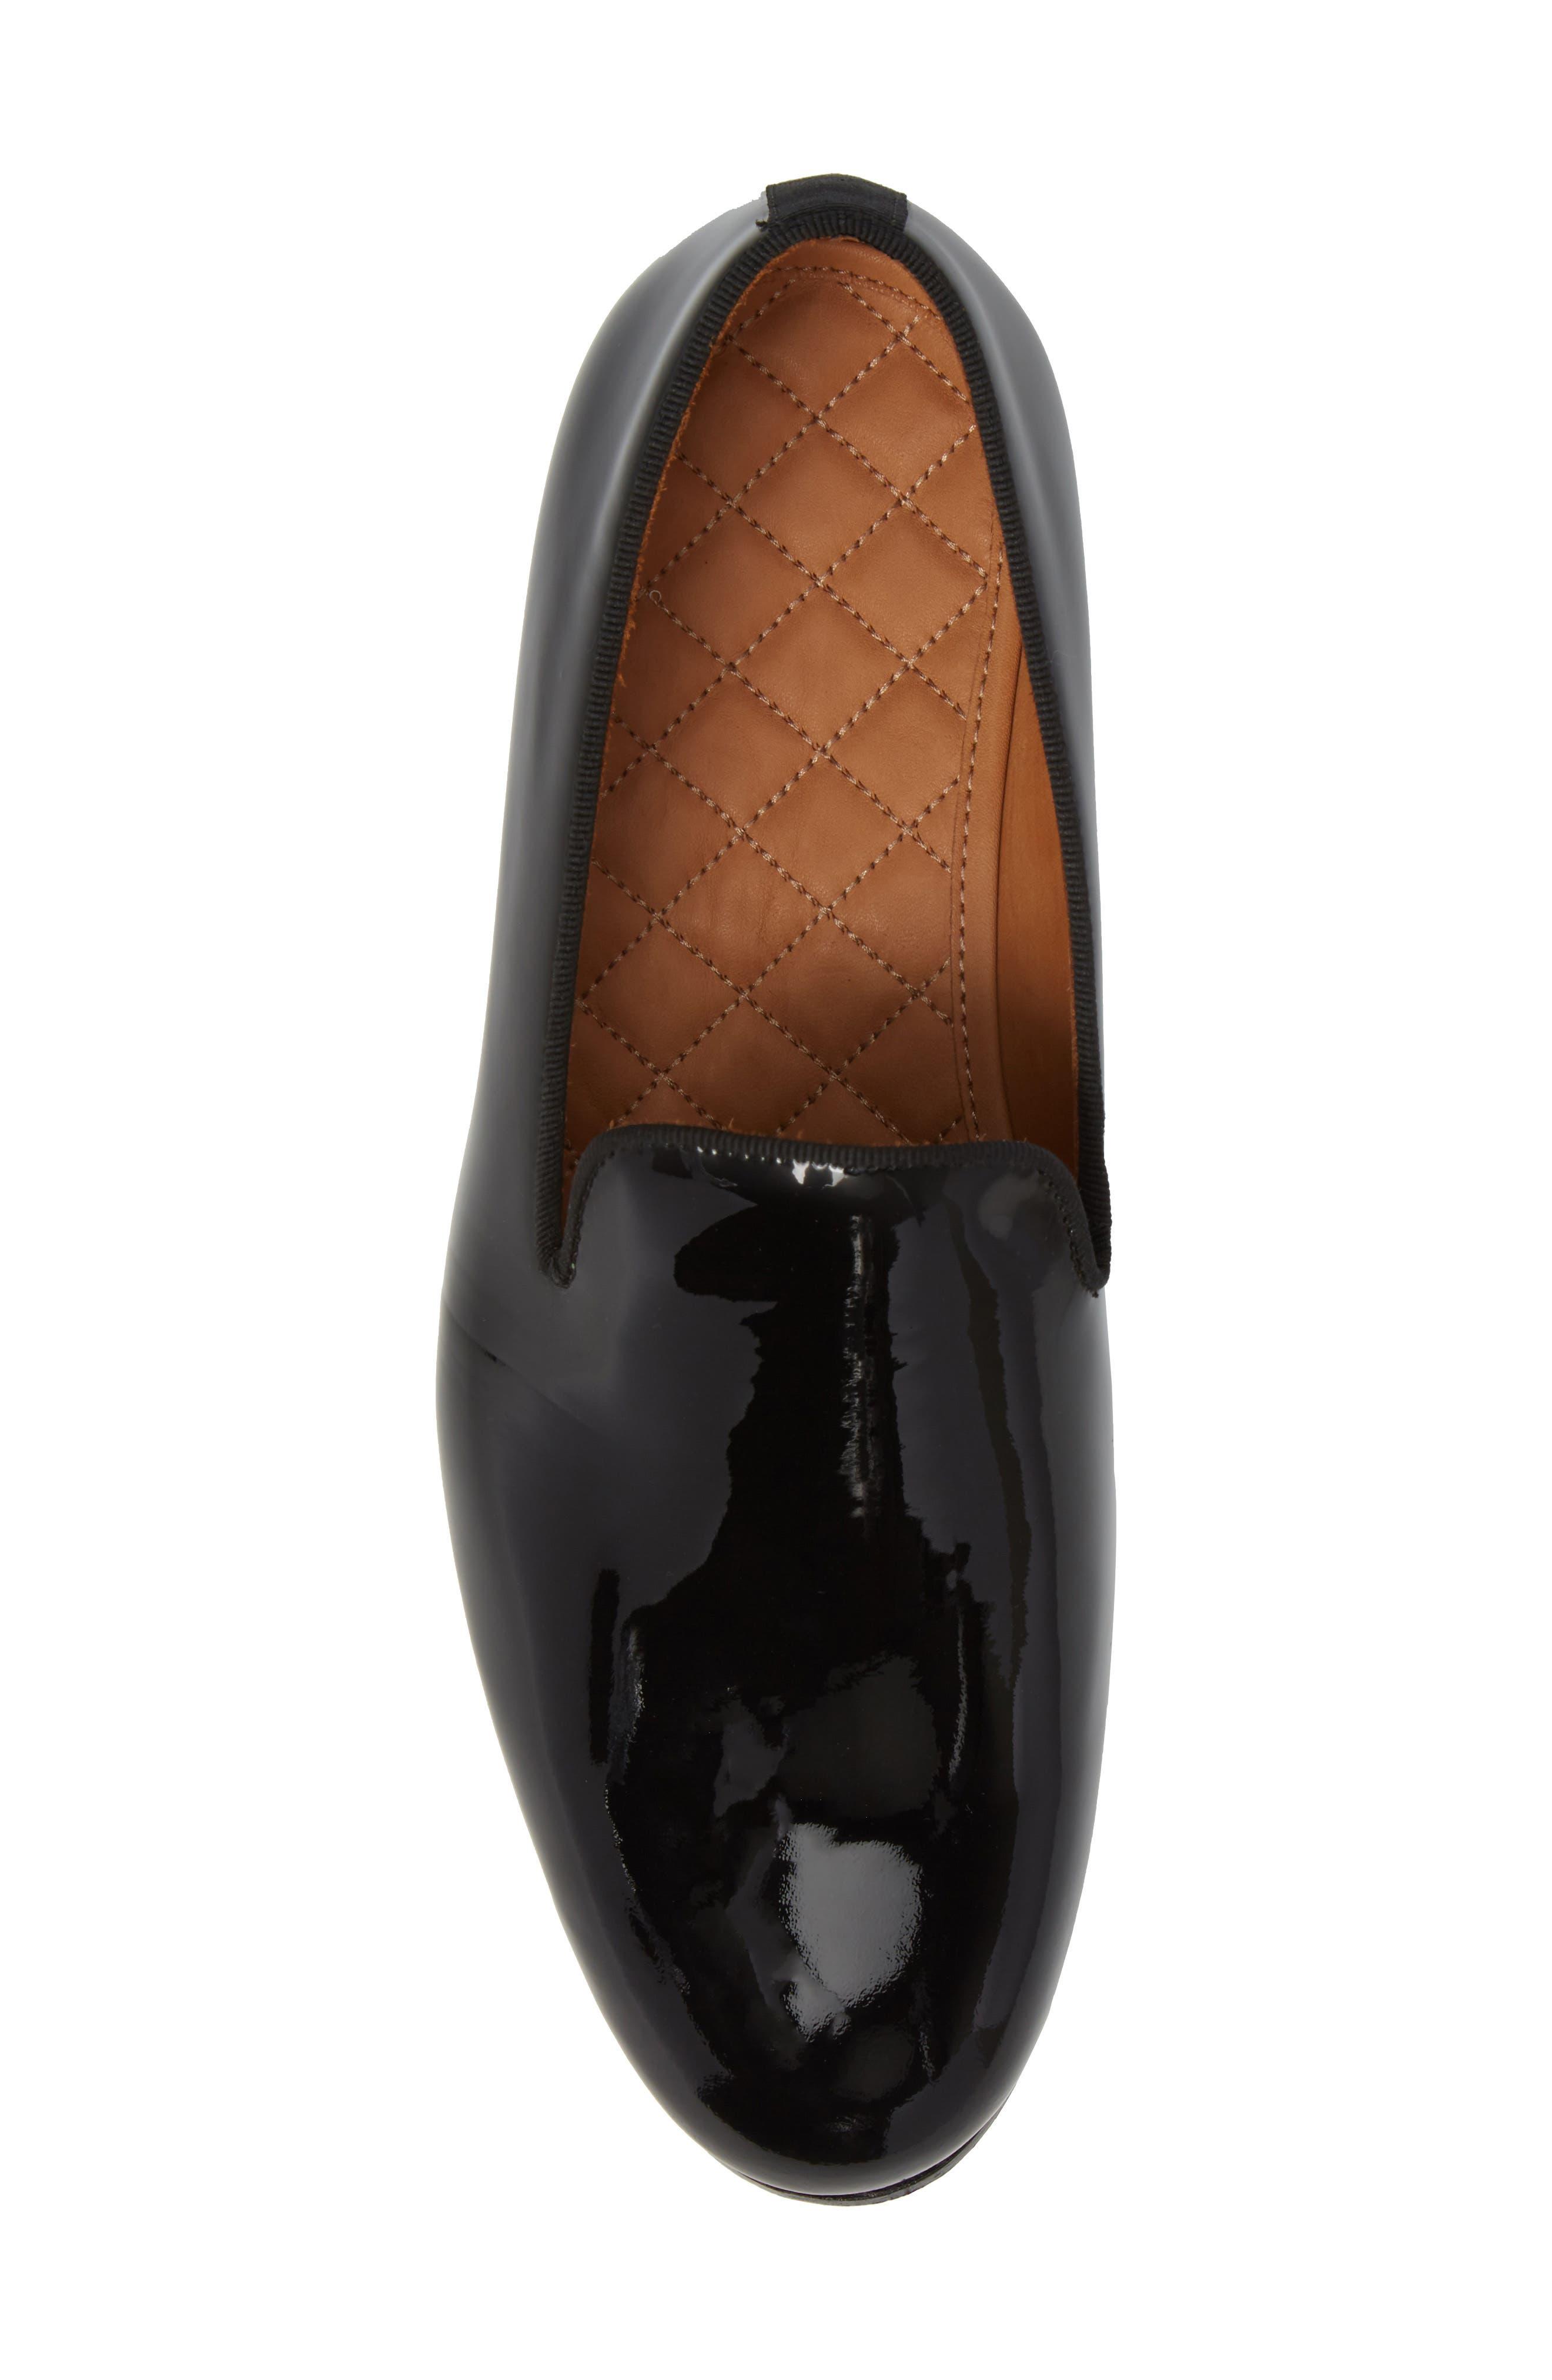 Bravi Loafer,                             Alternate thumbnail 5, color,                             Black Patent Leather